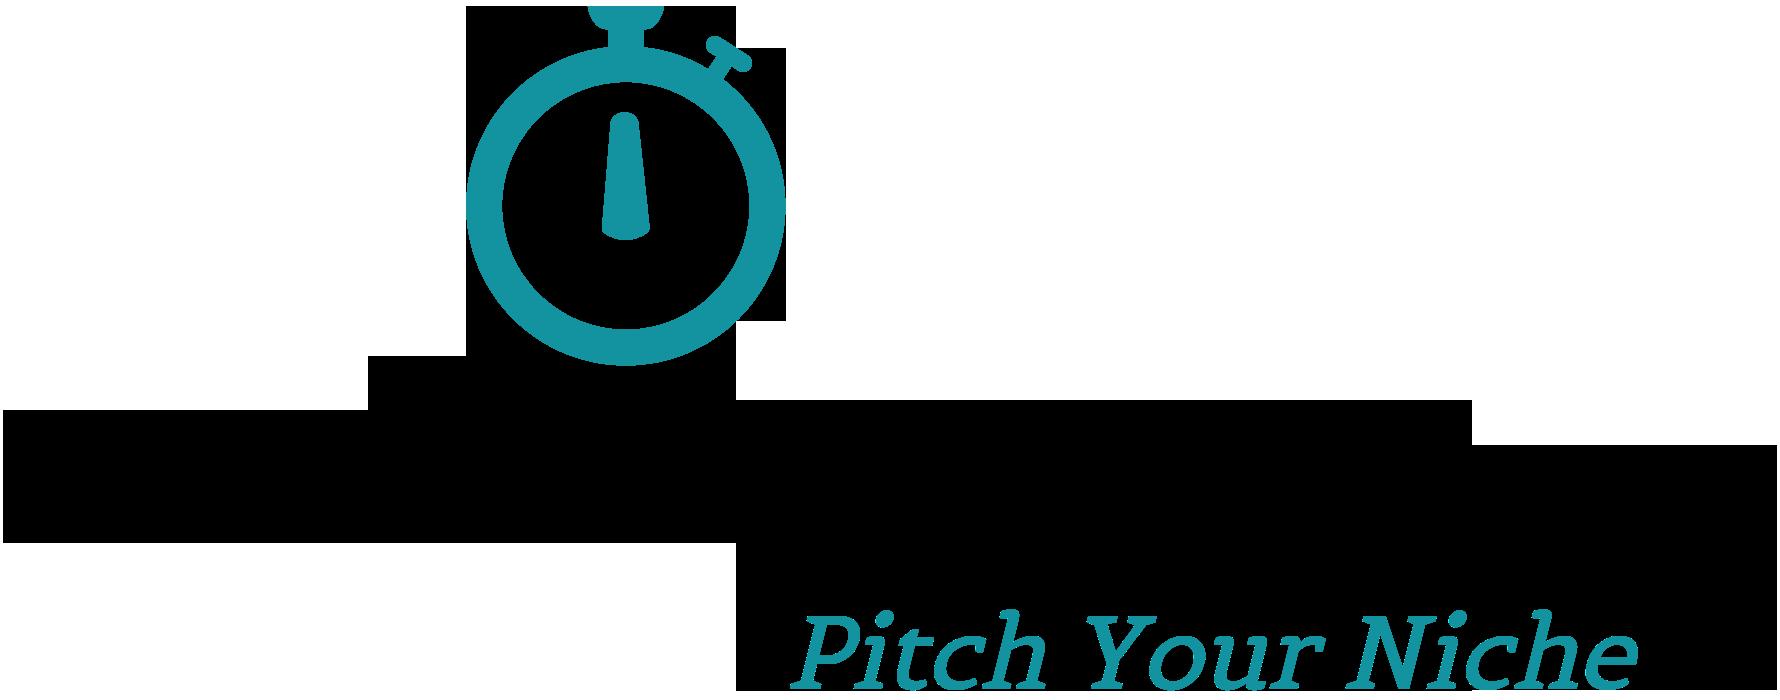 15-SecondPitch.com-logo.png